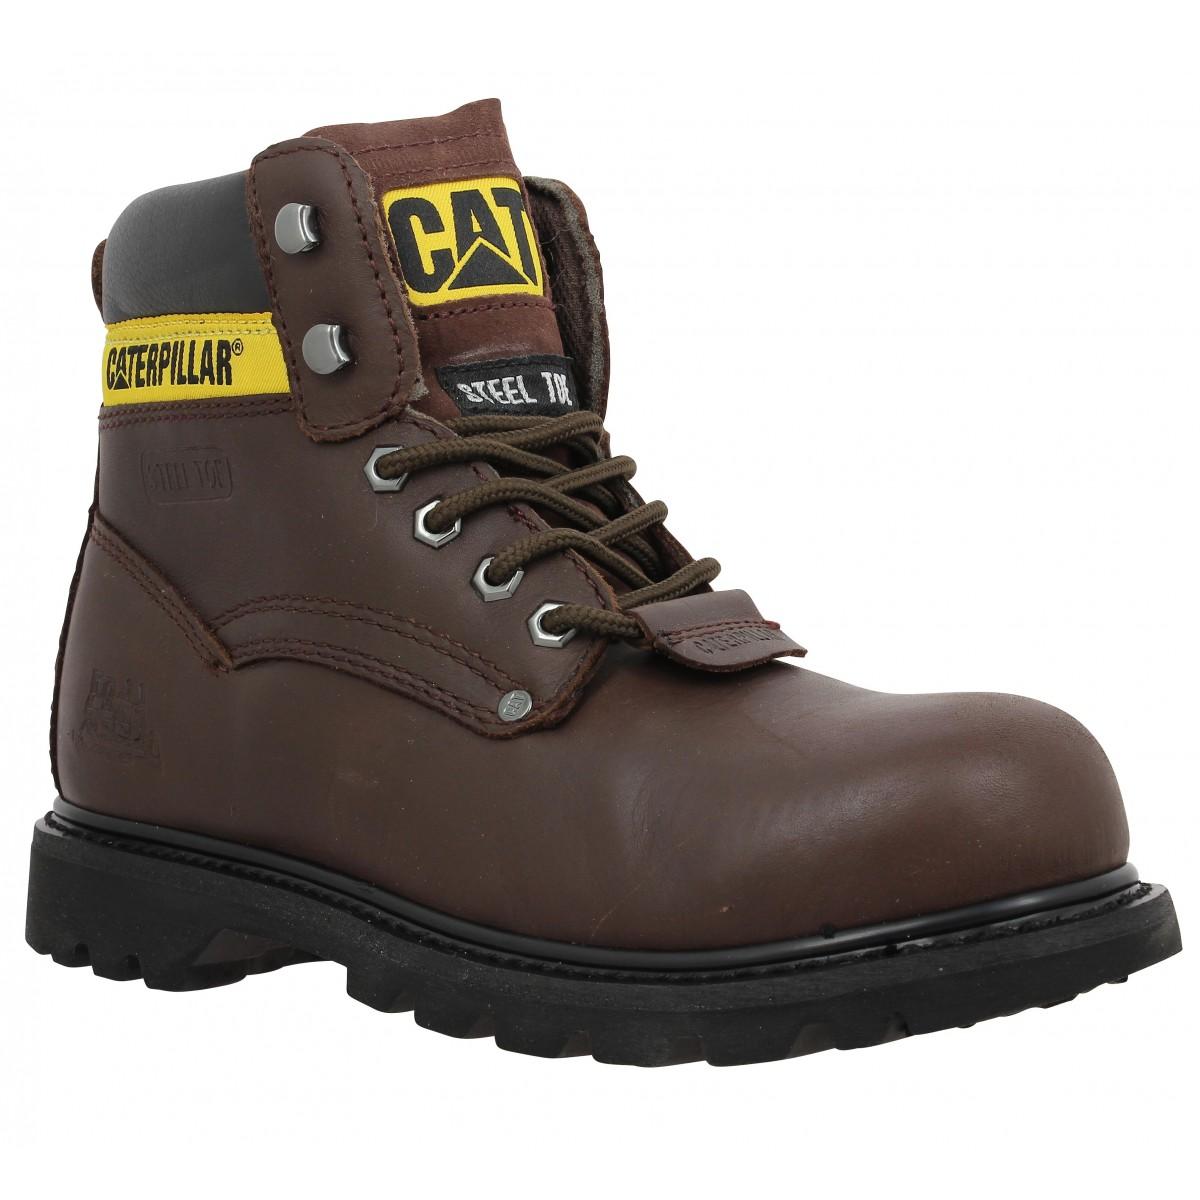 119a77a5073f31 Caterpillar sheffield marron homme | Fanny chaussures